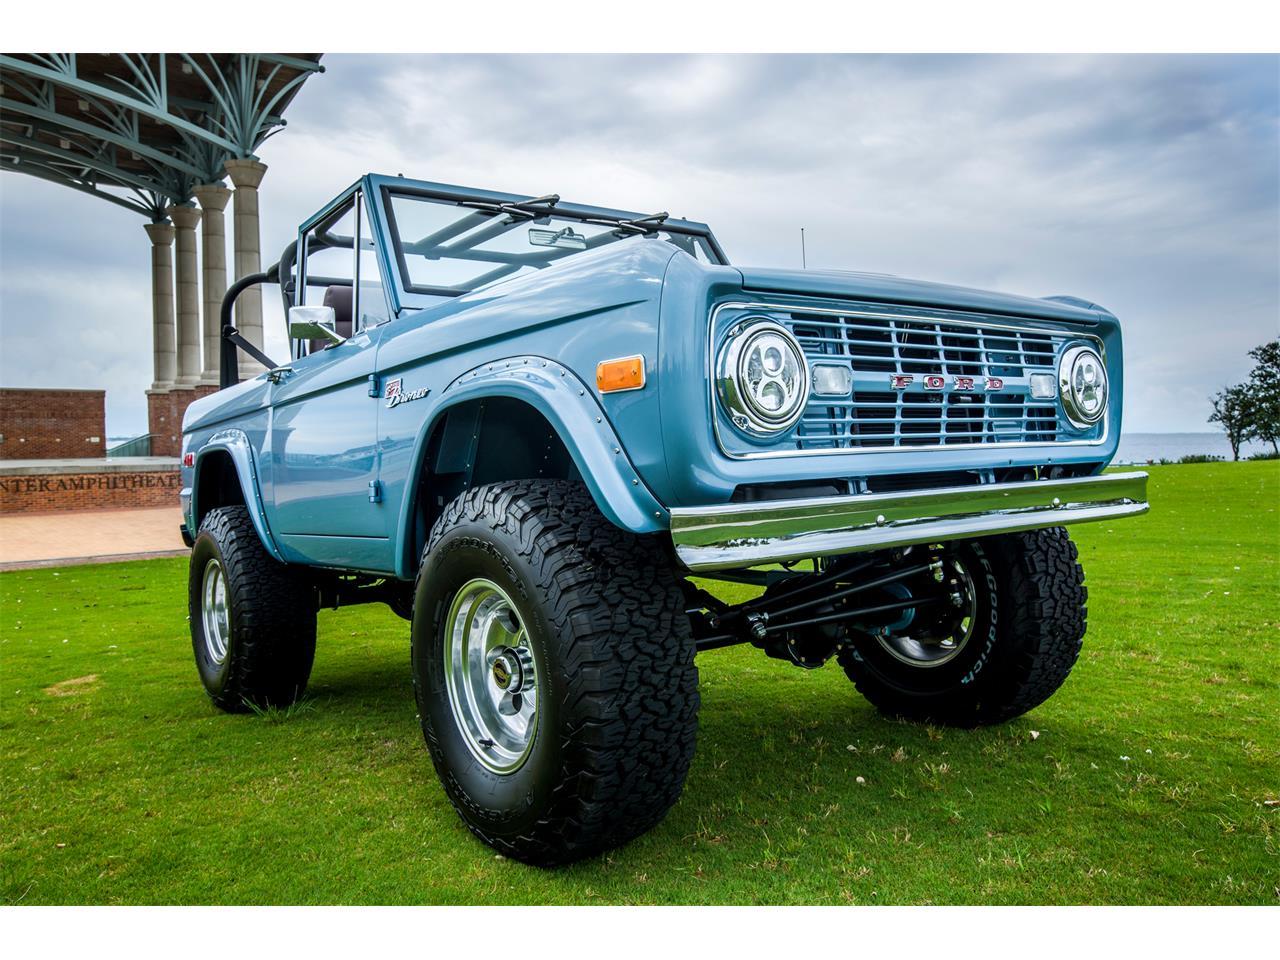 1974 Ford Bronco For Sale In Pensacola Fl Classiccarsbay Com